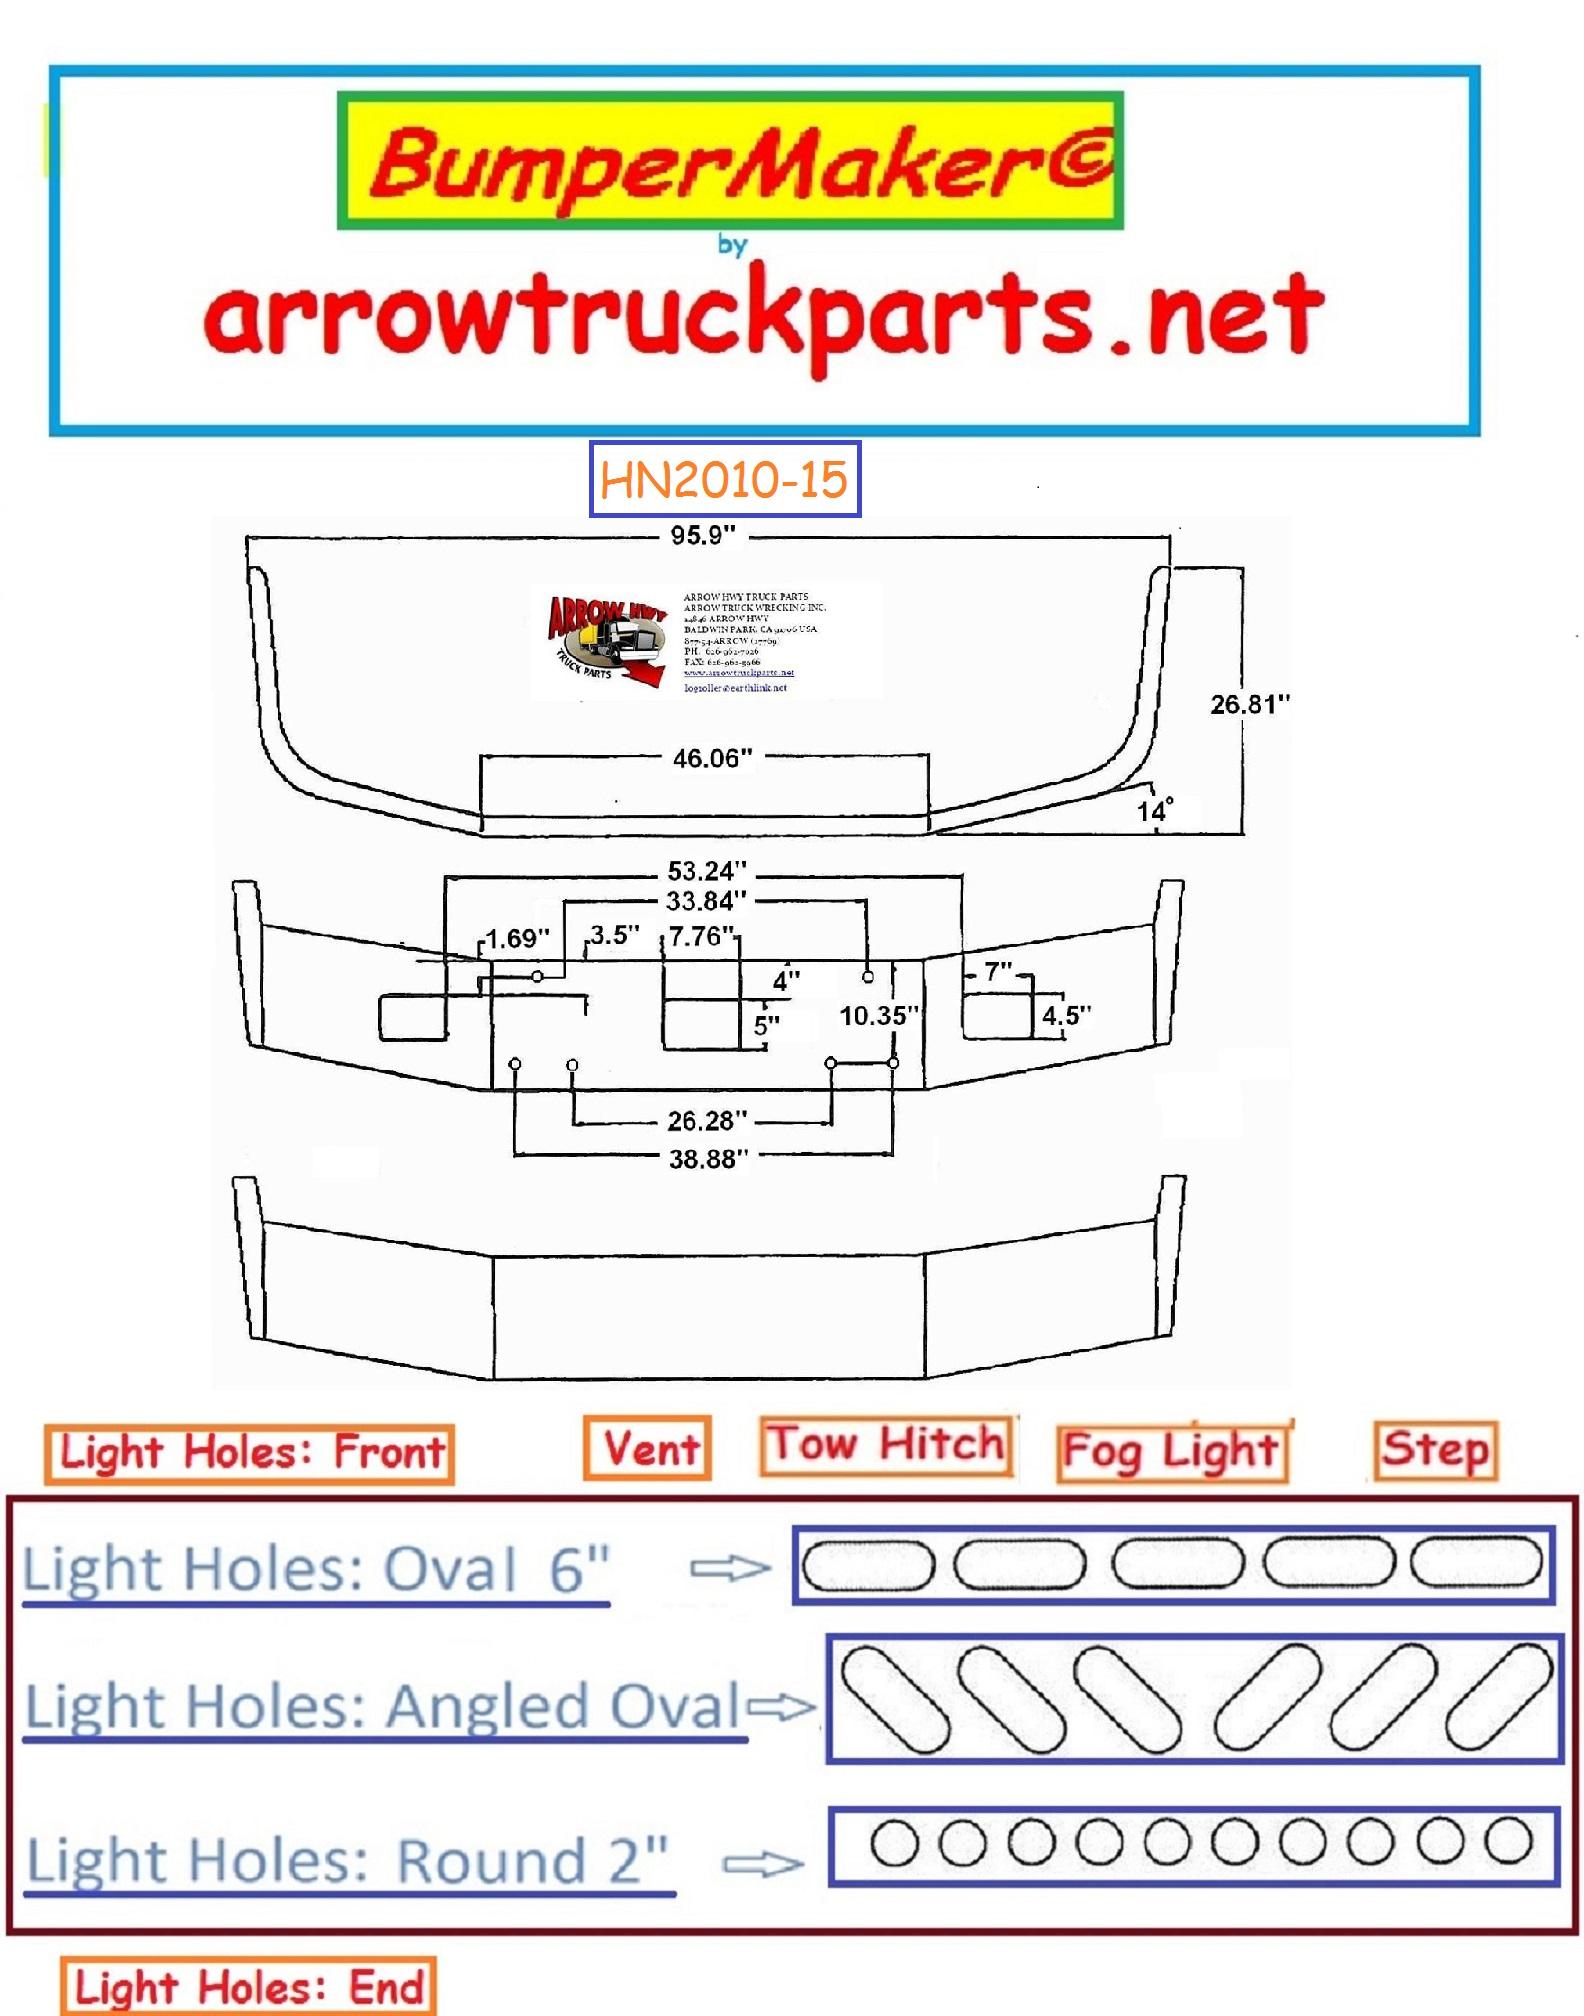 Legrand Rj45 Wiring Diagram : On q legrand rj wiring diagram home theater